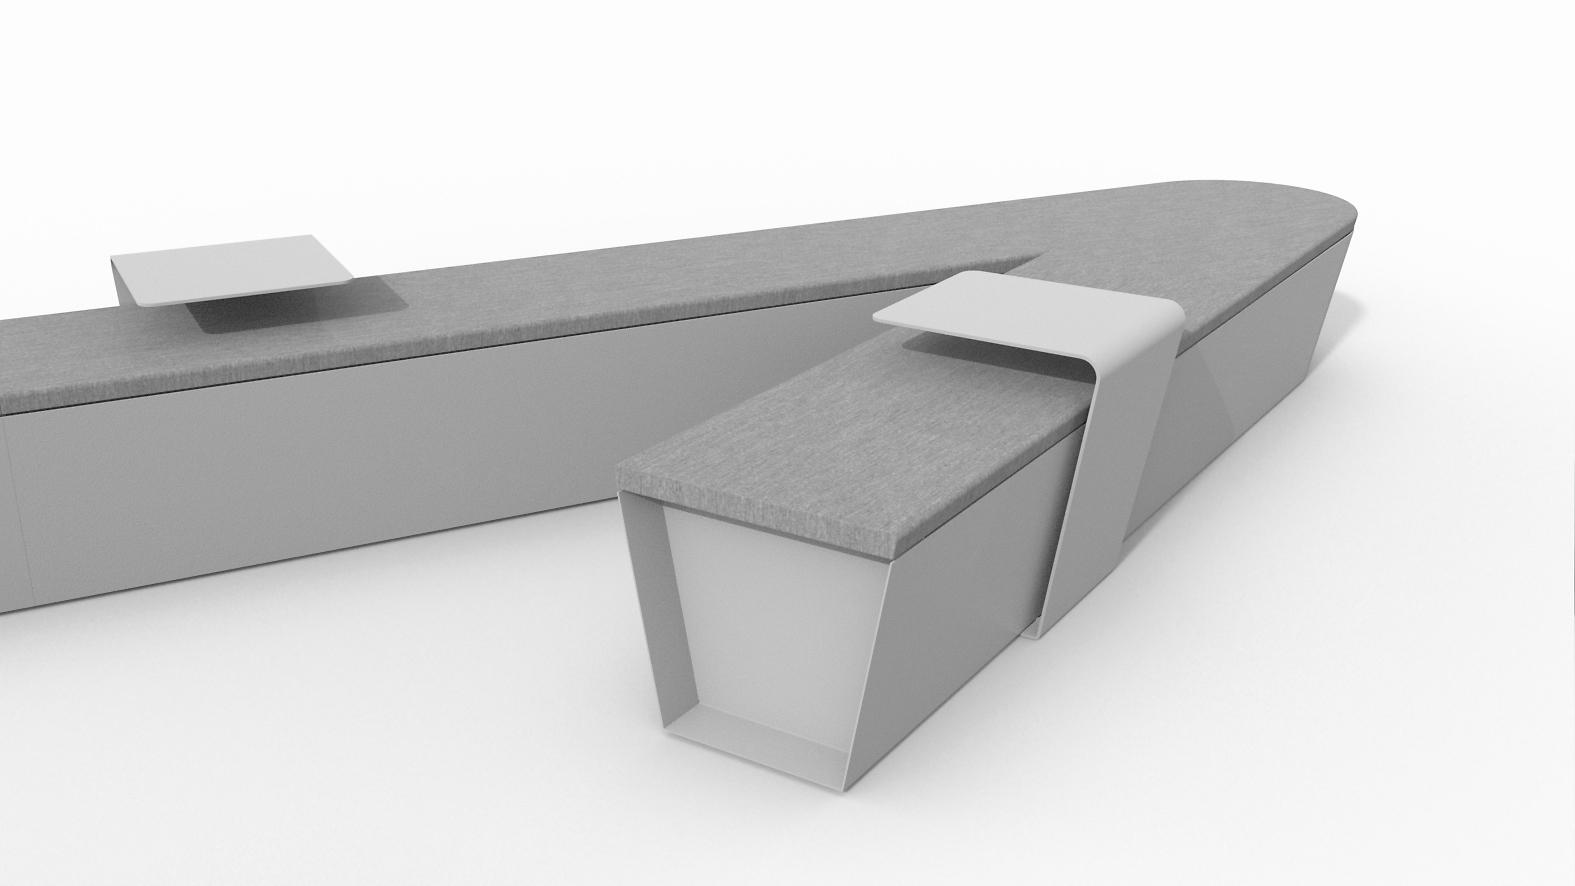 Smart bench arredo urbano panchine intelligenti lab23 for Smart arredo